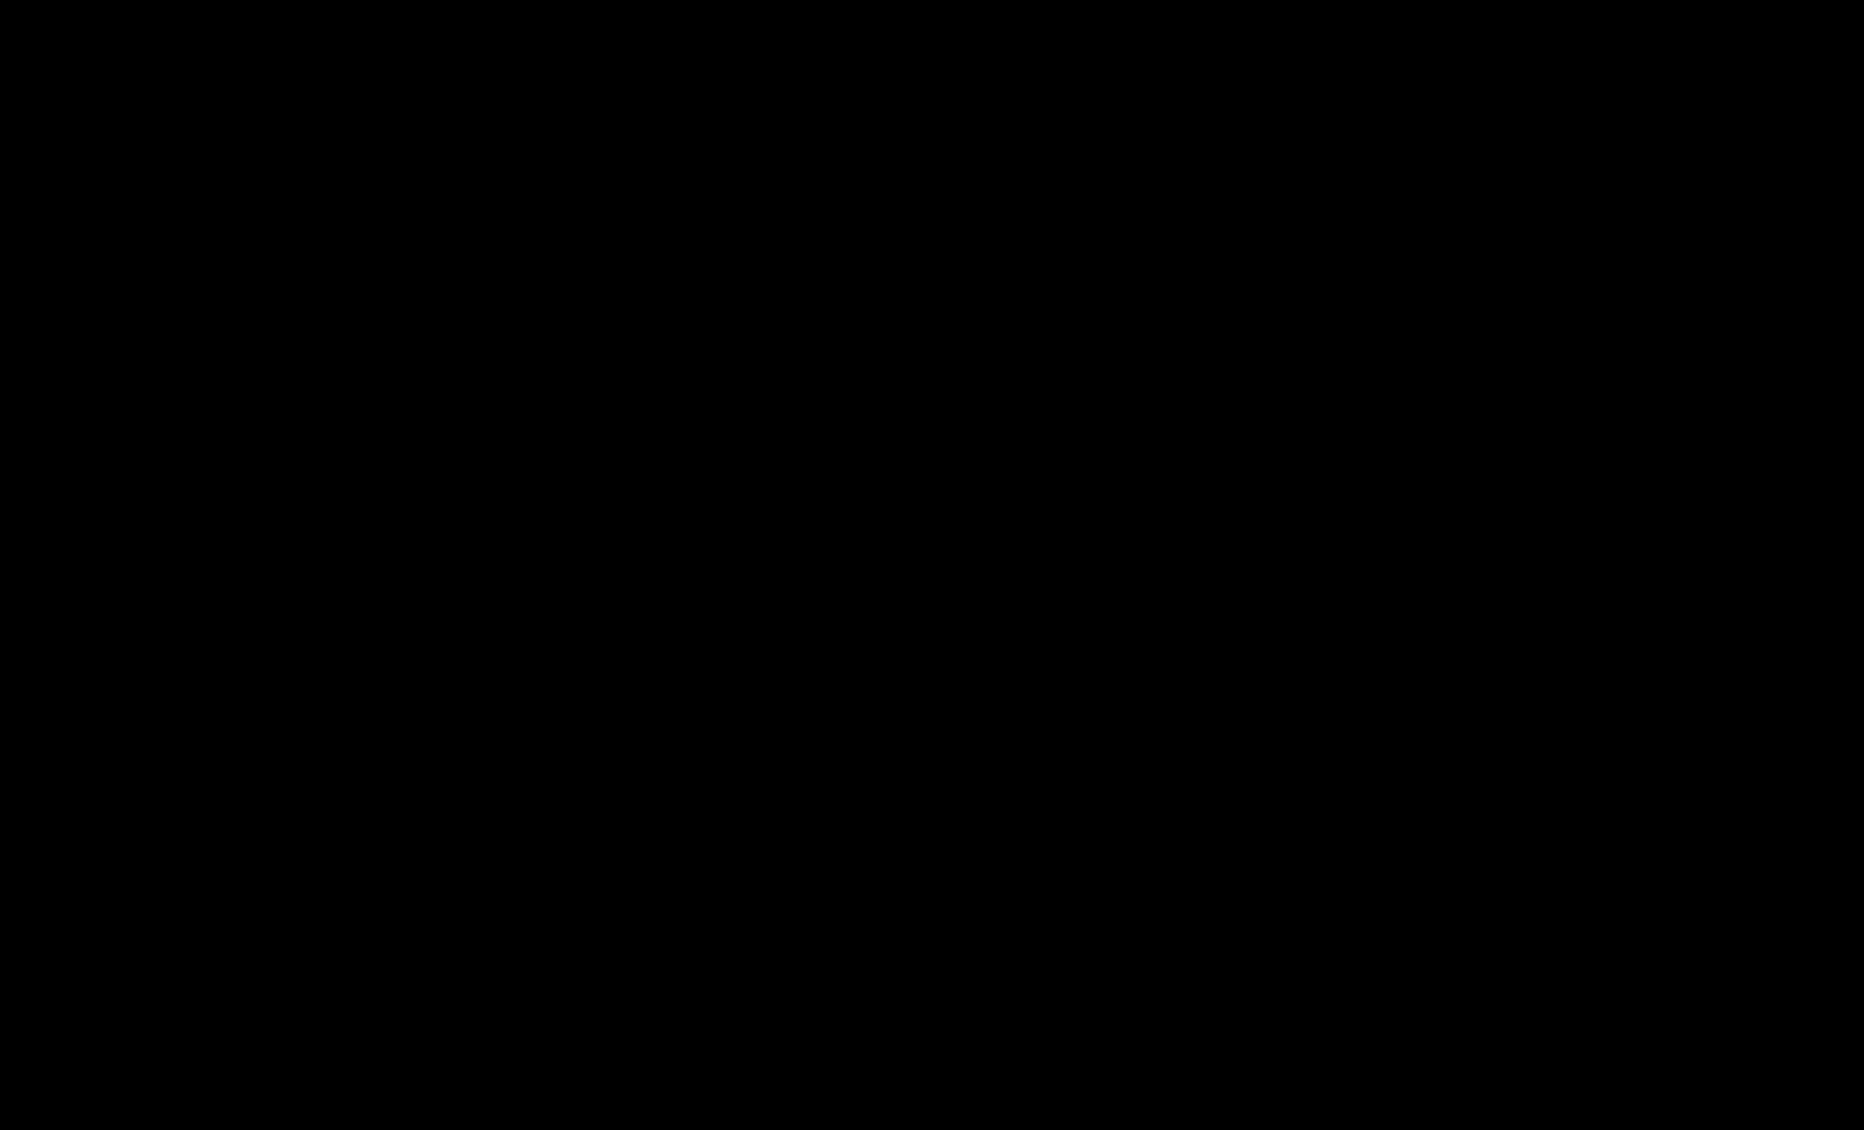 Cerberus K9